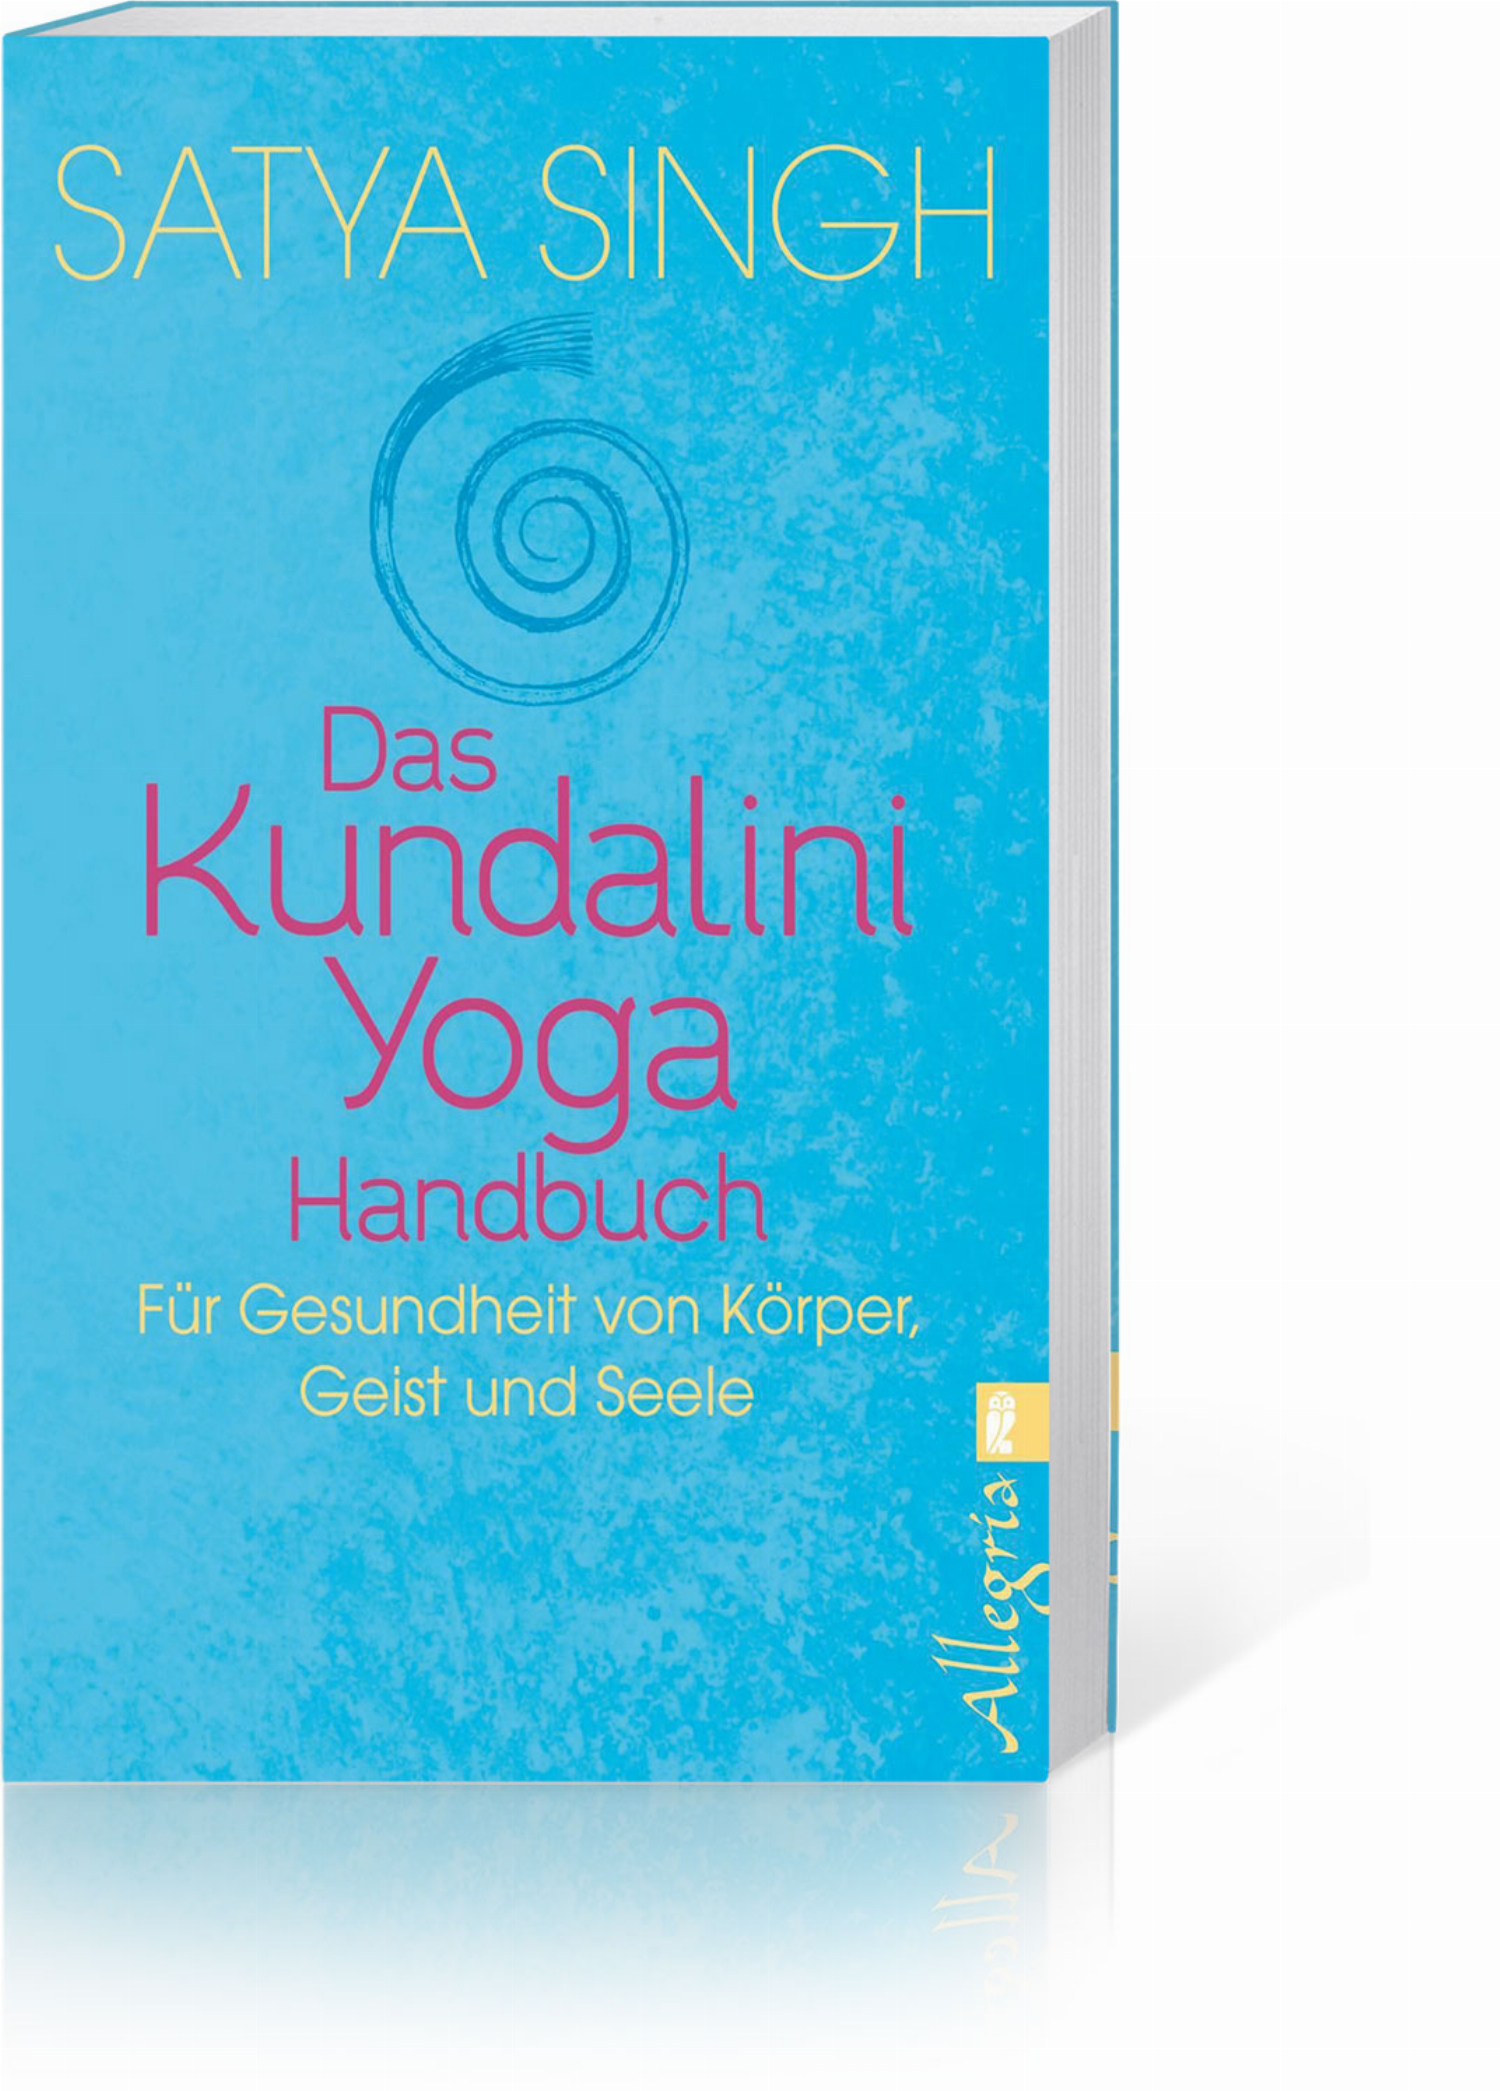 Das Kundalini-Yoga-Handbuch, Produktbild 1